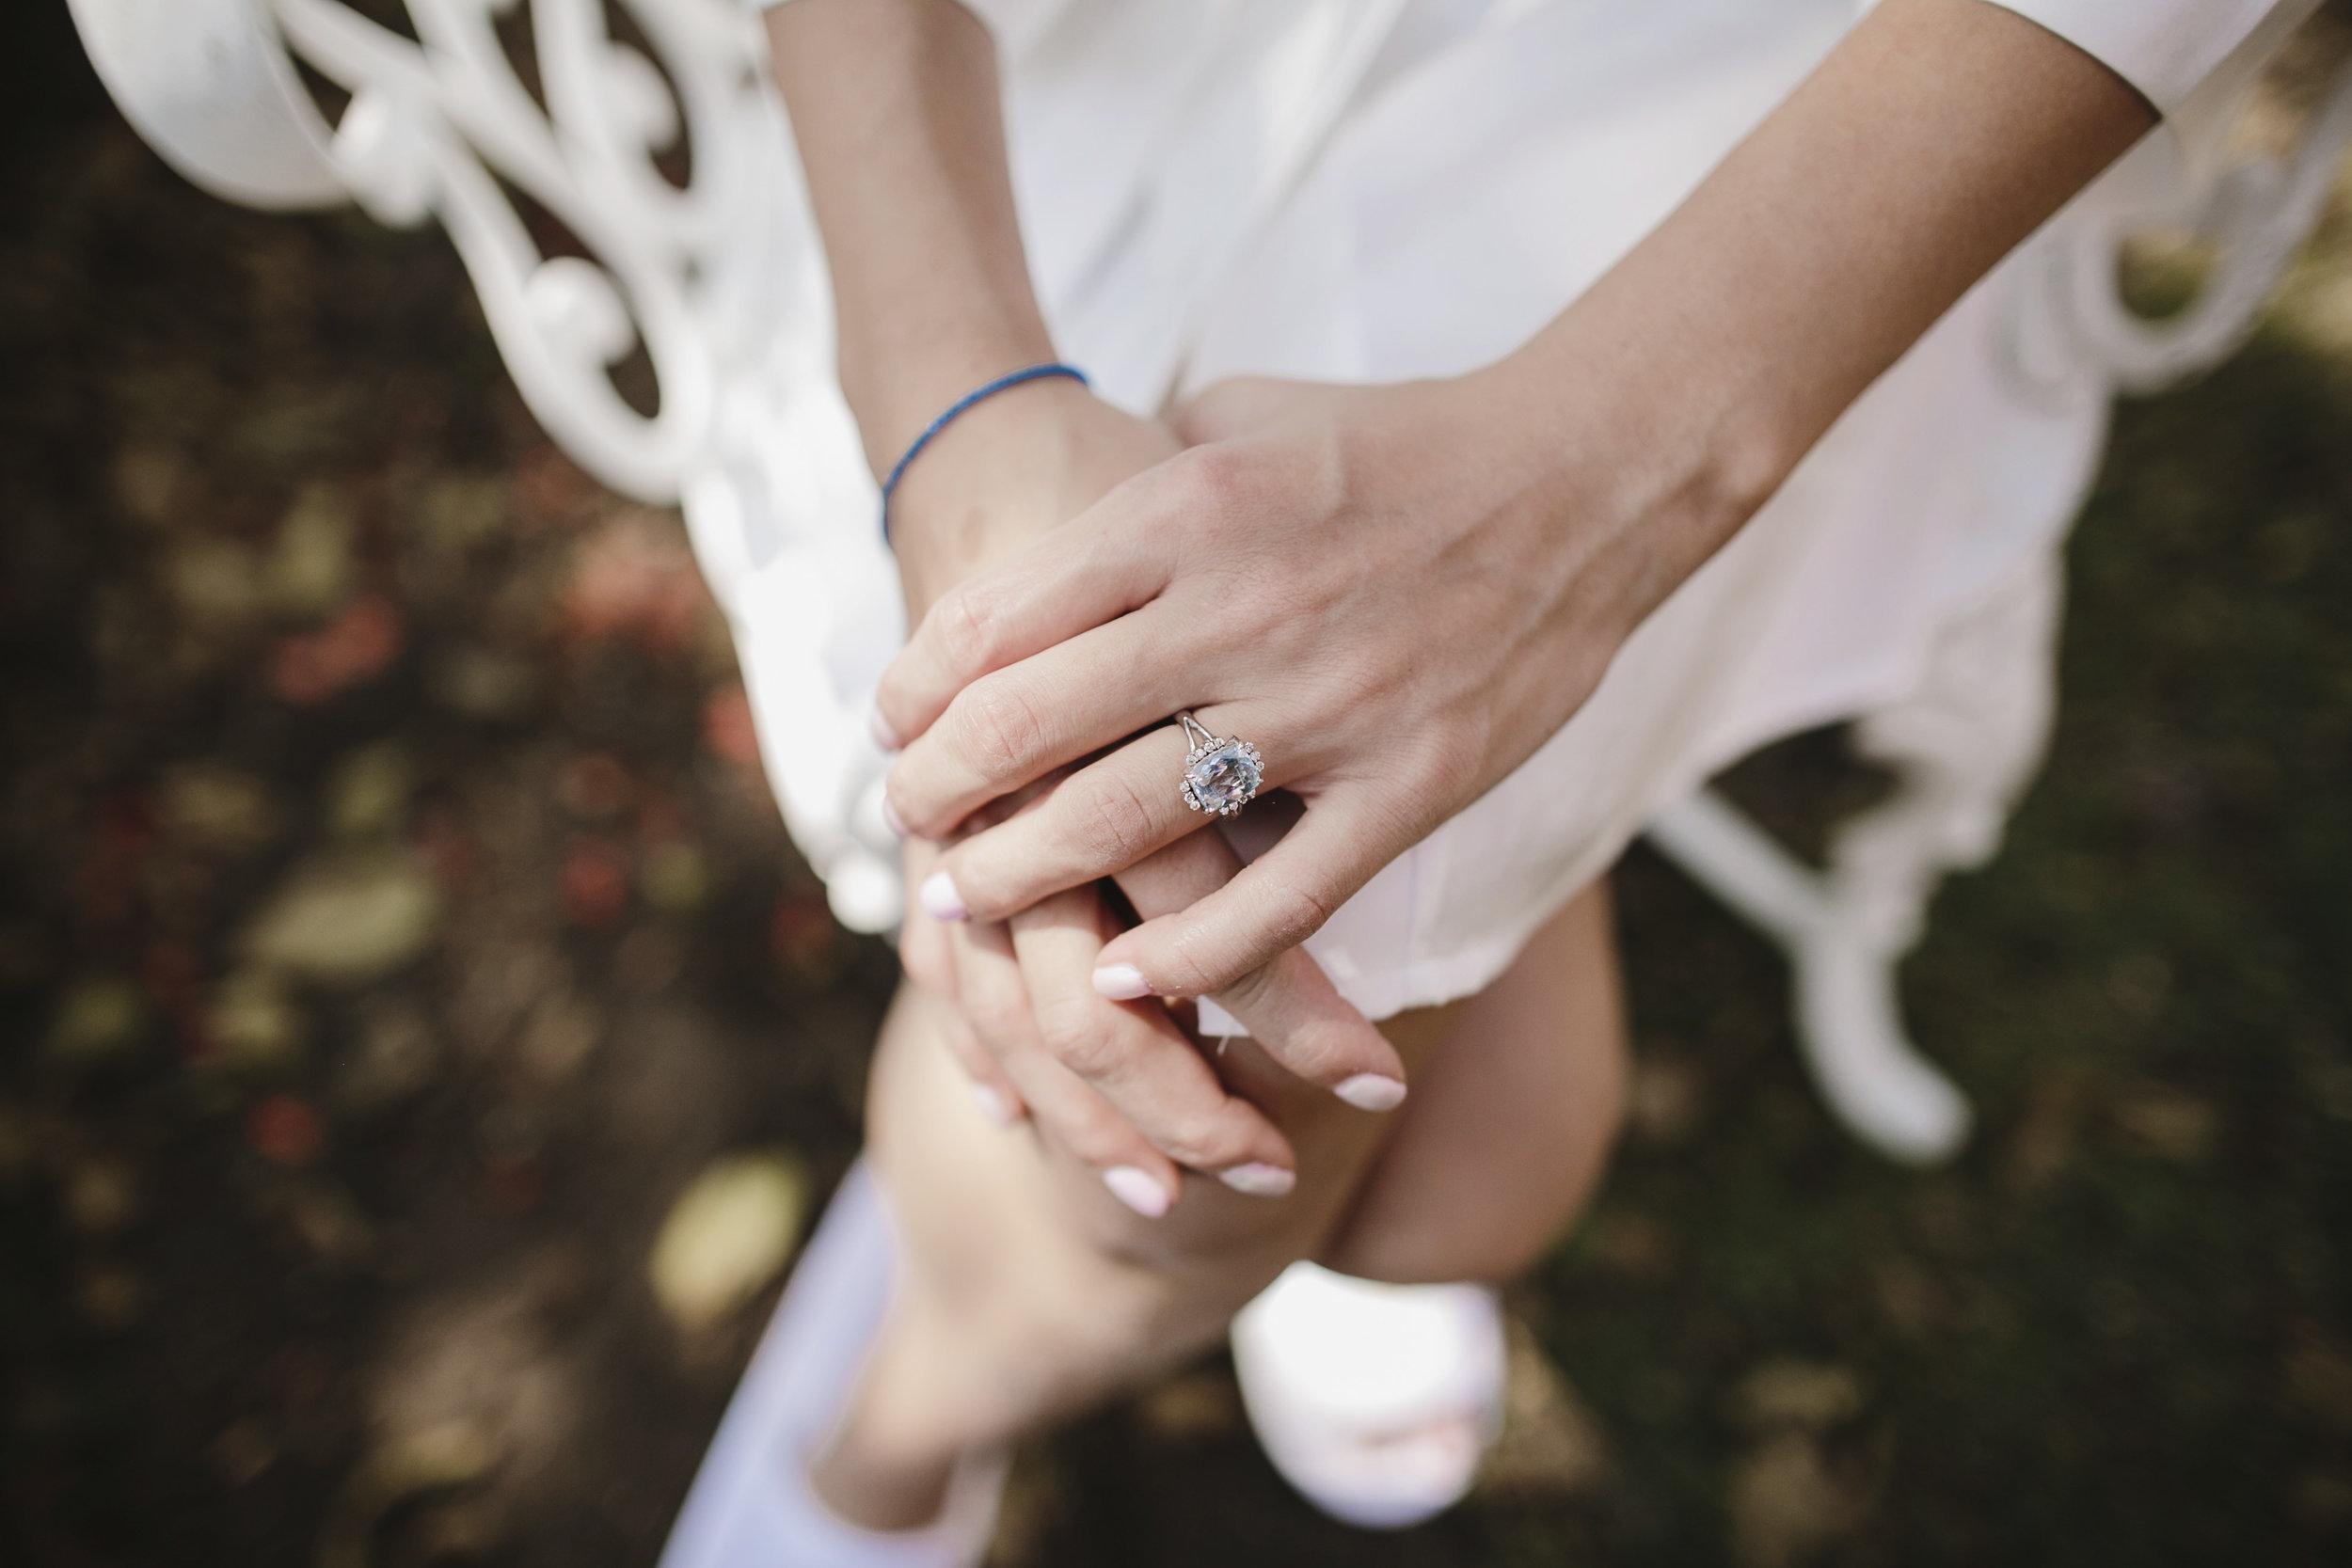 alfons_flores_destination_wedding_photography_mavi_david-645.JPG